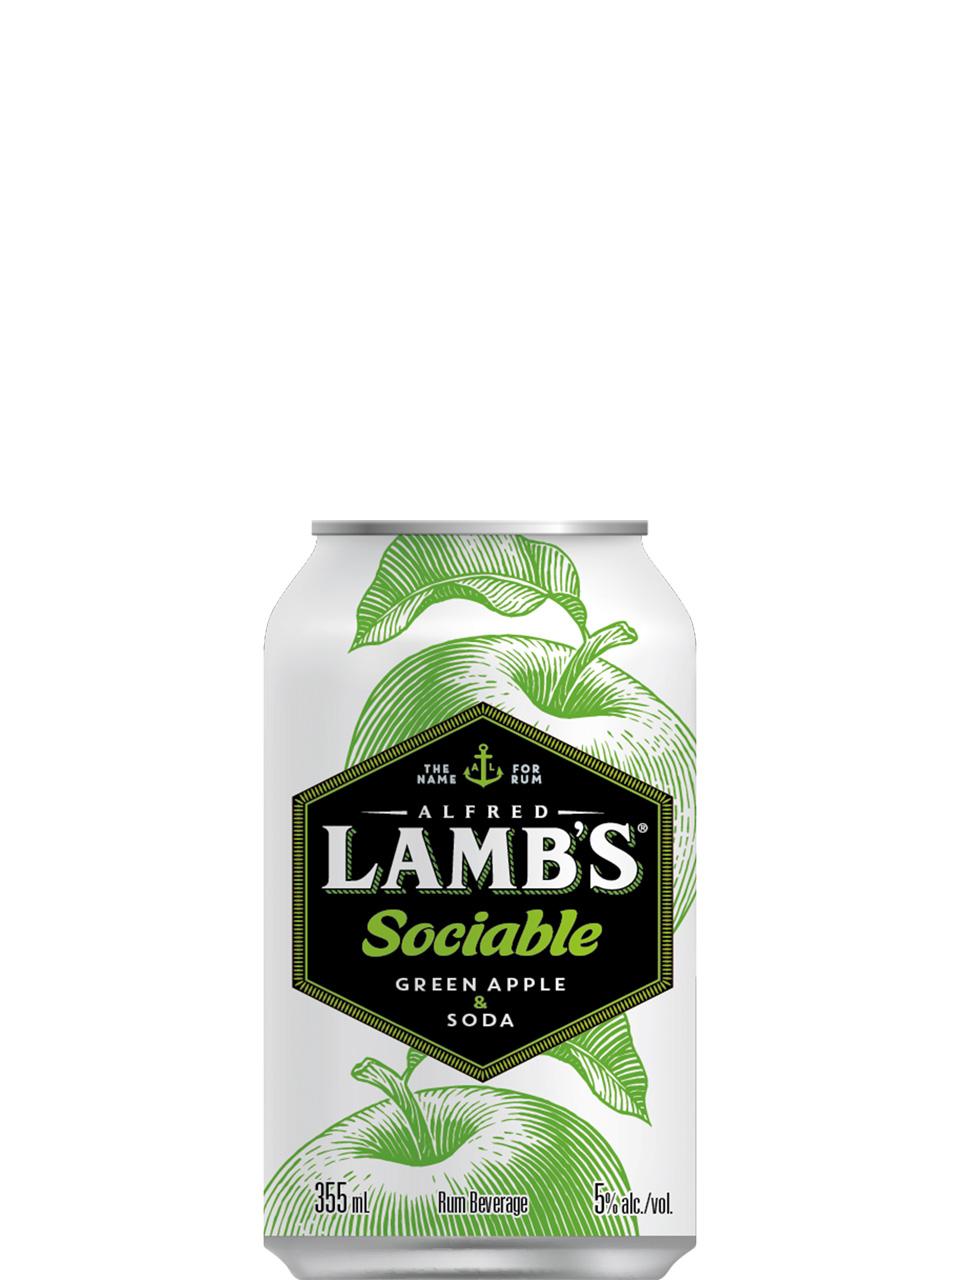 Lamb's Sociable Green Apple & Soda 6 Pack Cans